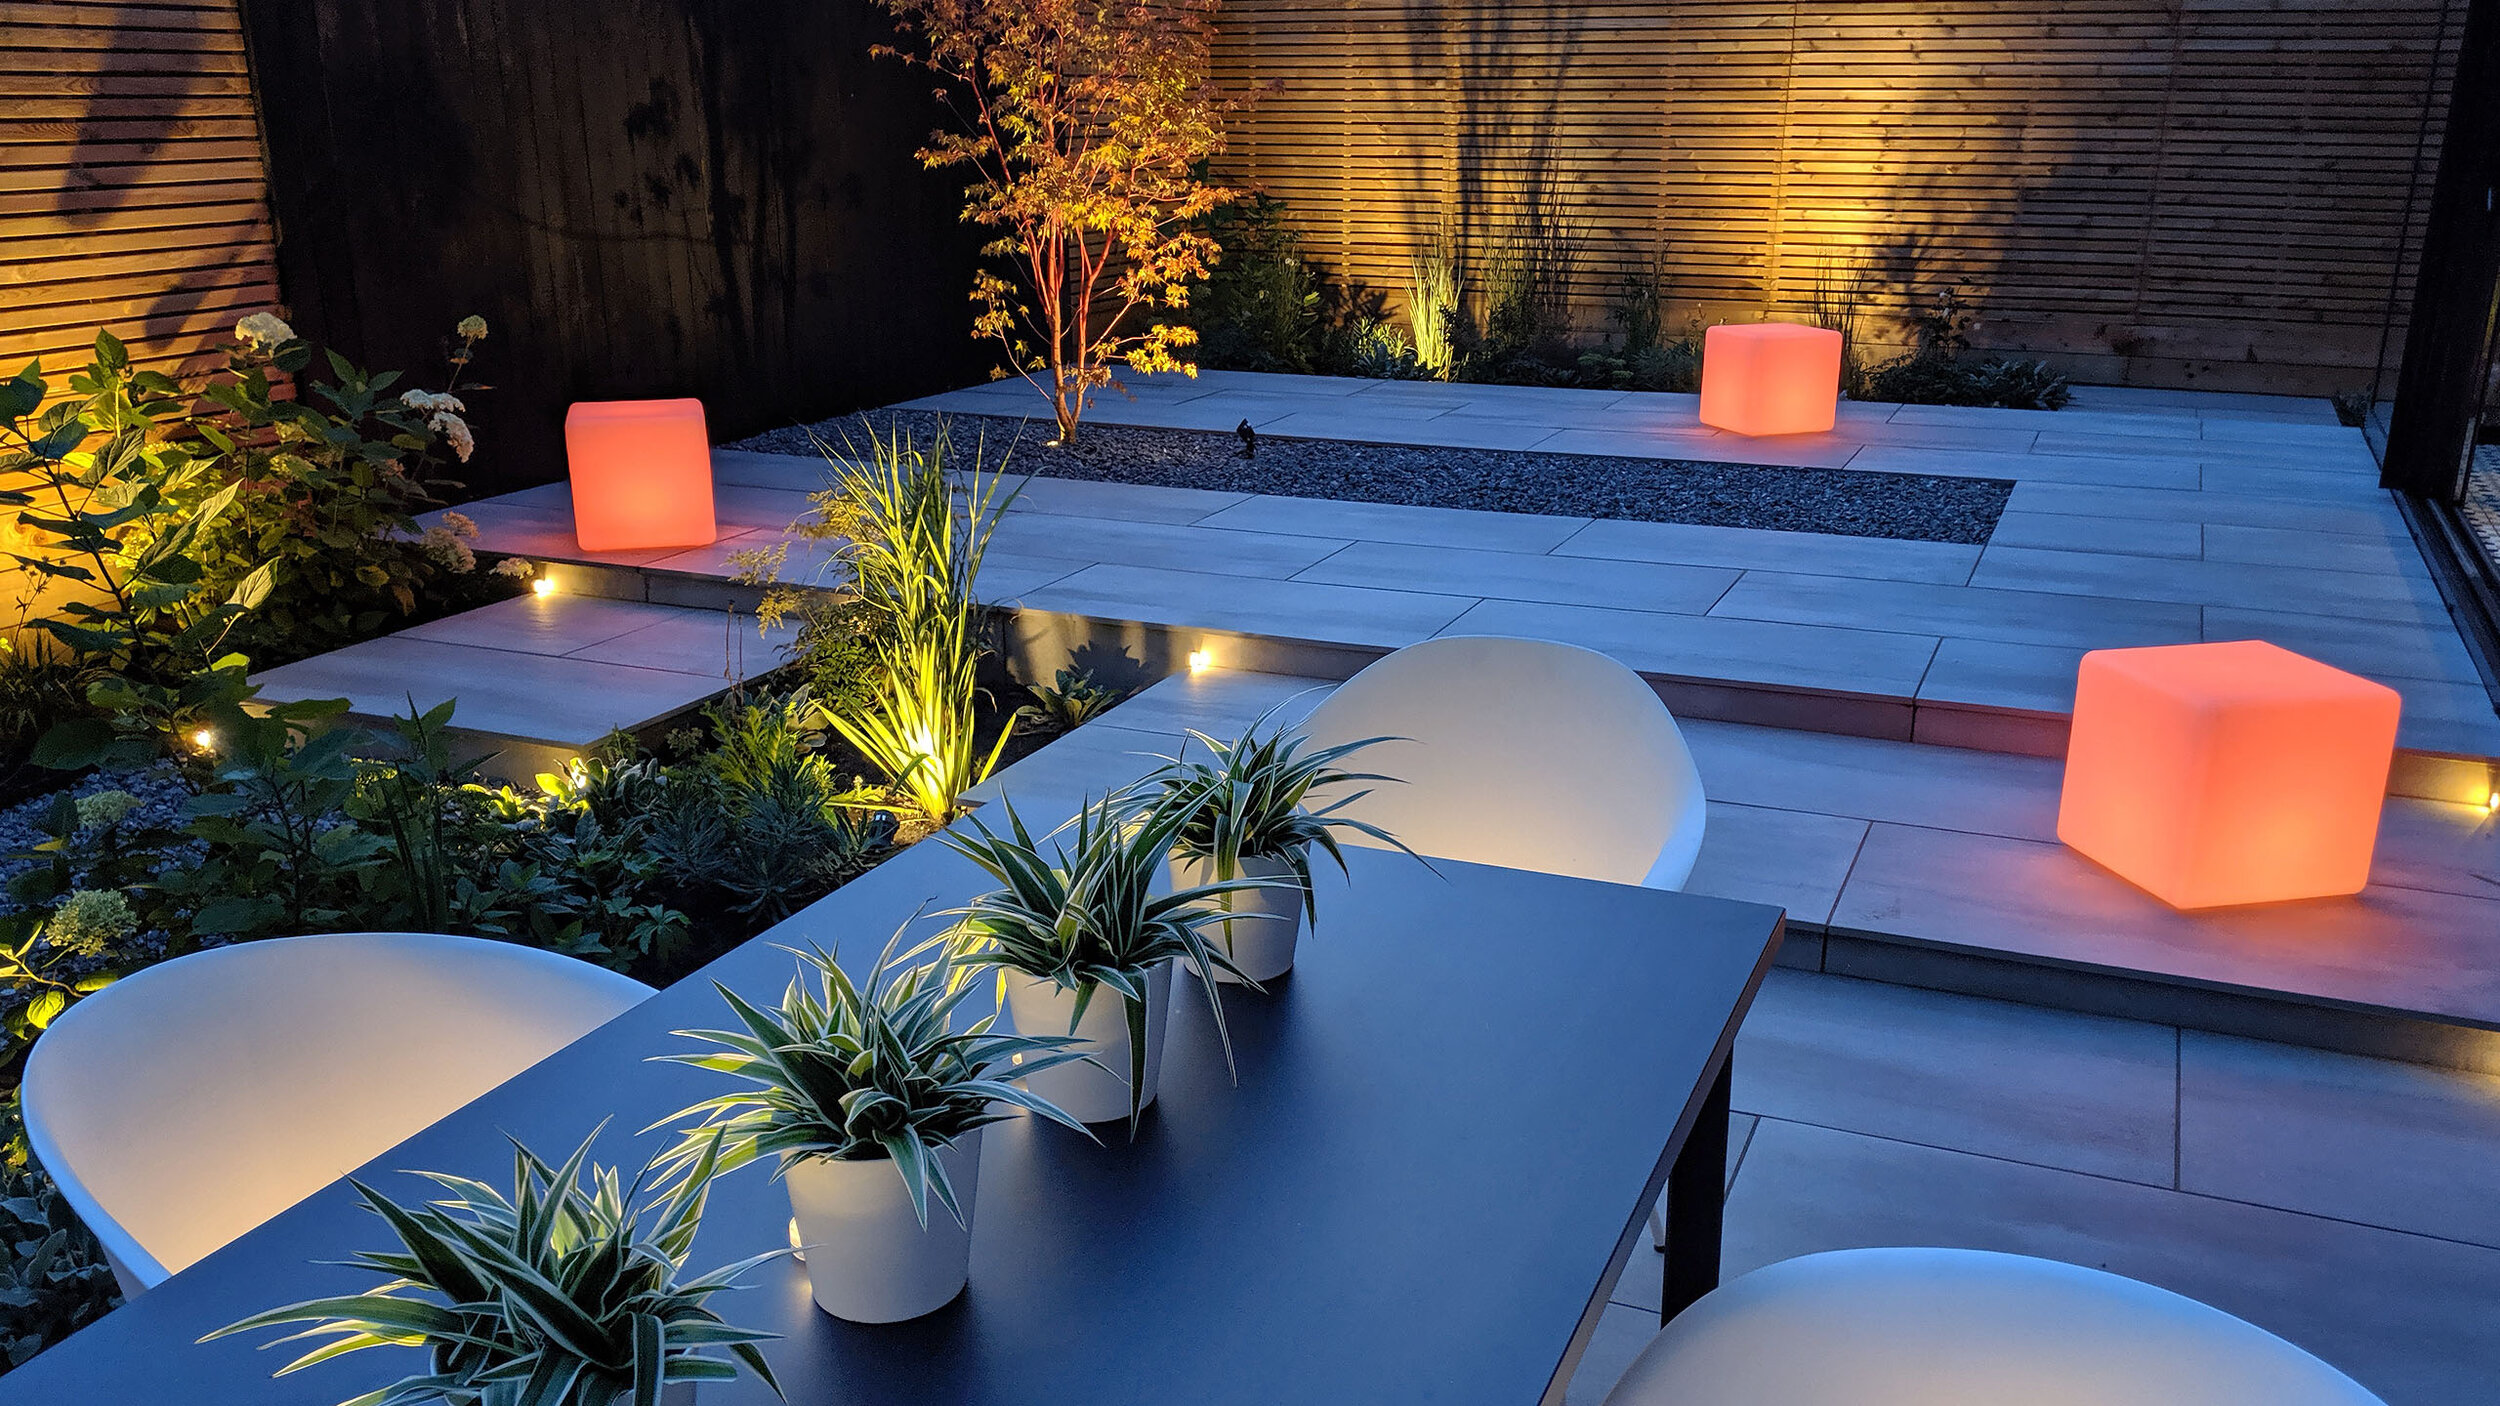 Cheshire Garden Designer And Landscaper Kirman Design